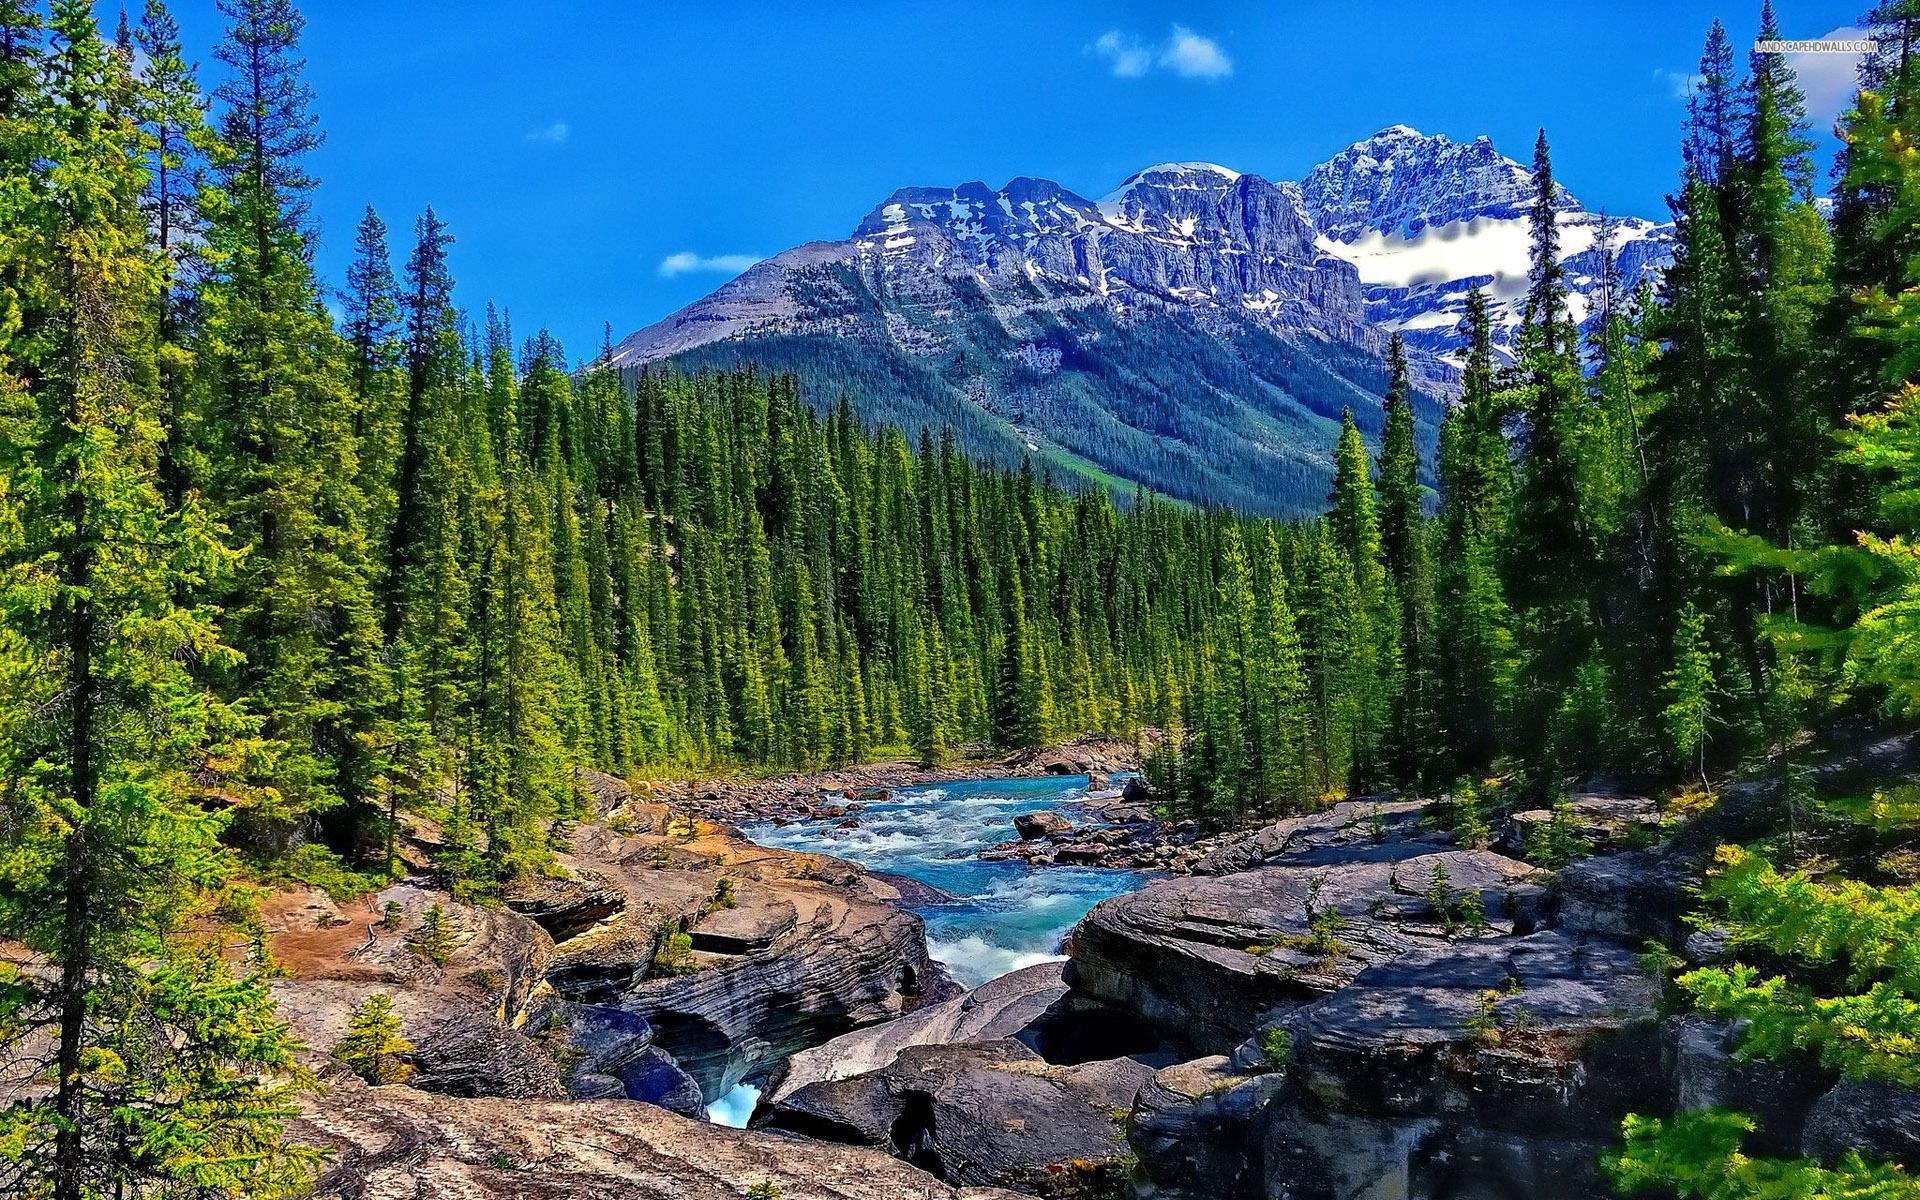 Amazing mountain stream Wallpaper